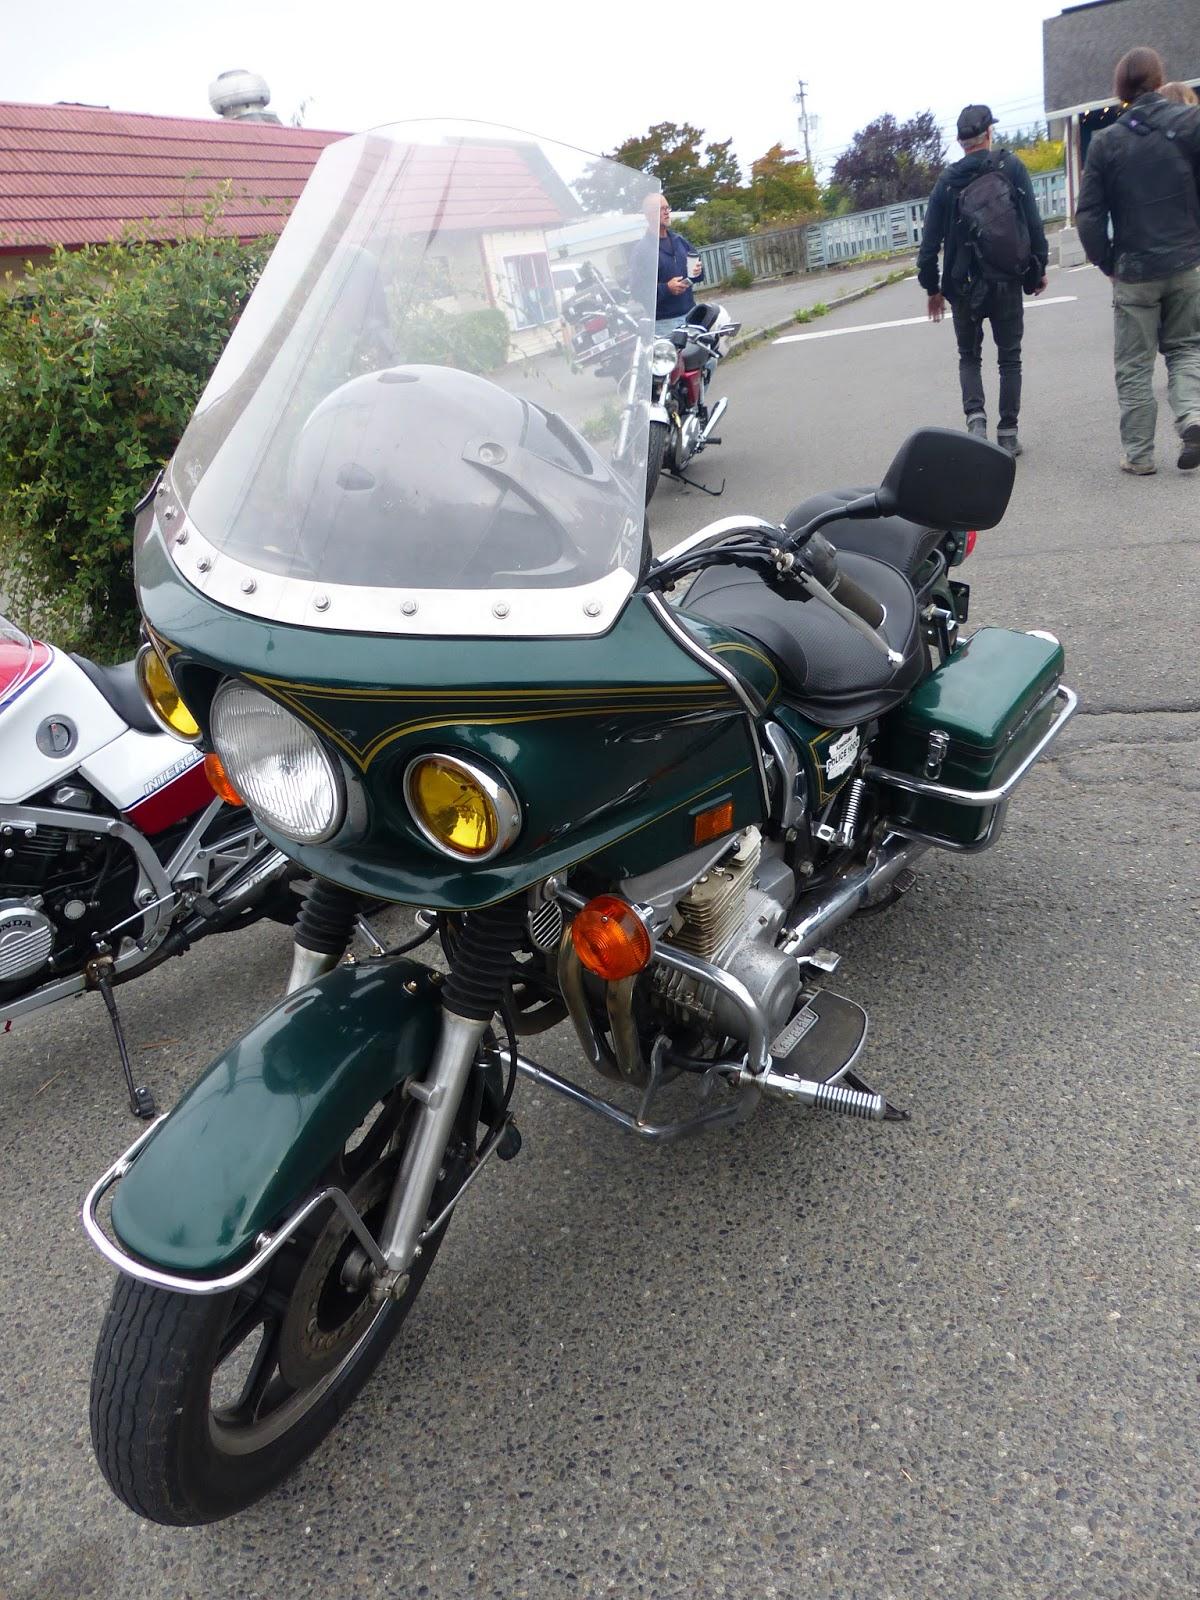 Review of Kawasaki KZ 1000 Police KZ 1000 Police: pictures